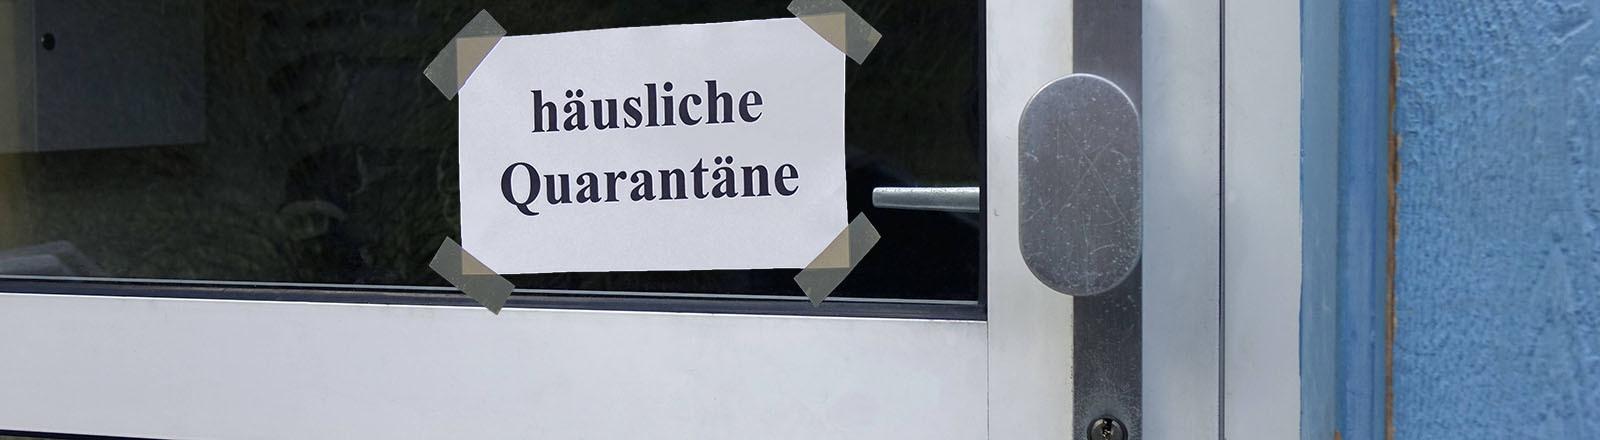 Quarantäne Brandenburg Coronavirus 12.03.2020